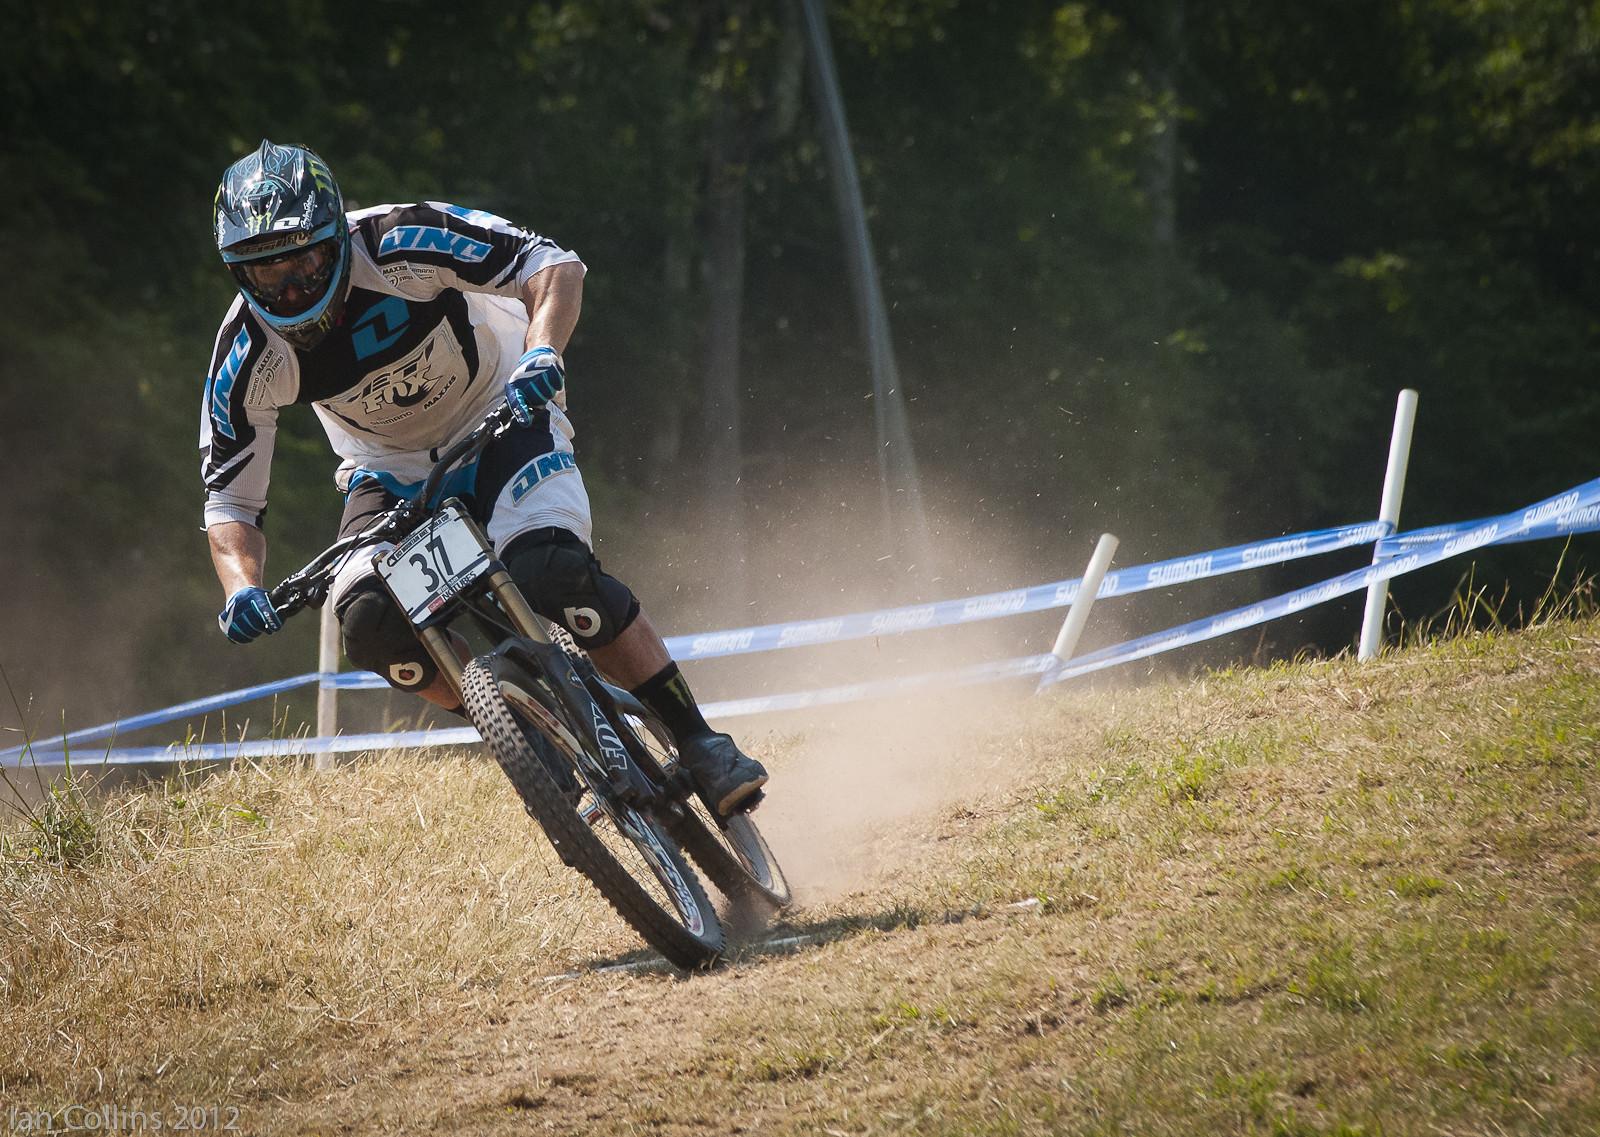 Jared Graves - Ian Collins - Mountain Biking Pictures - Vital MTB